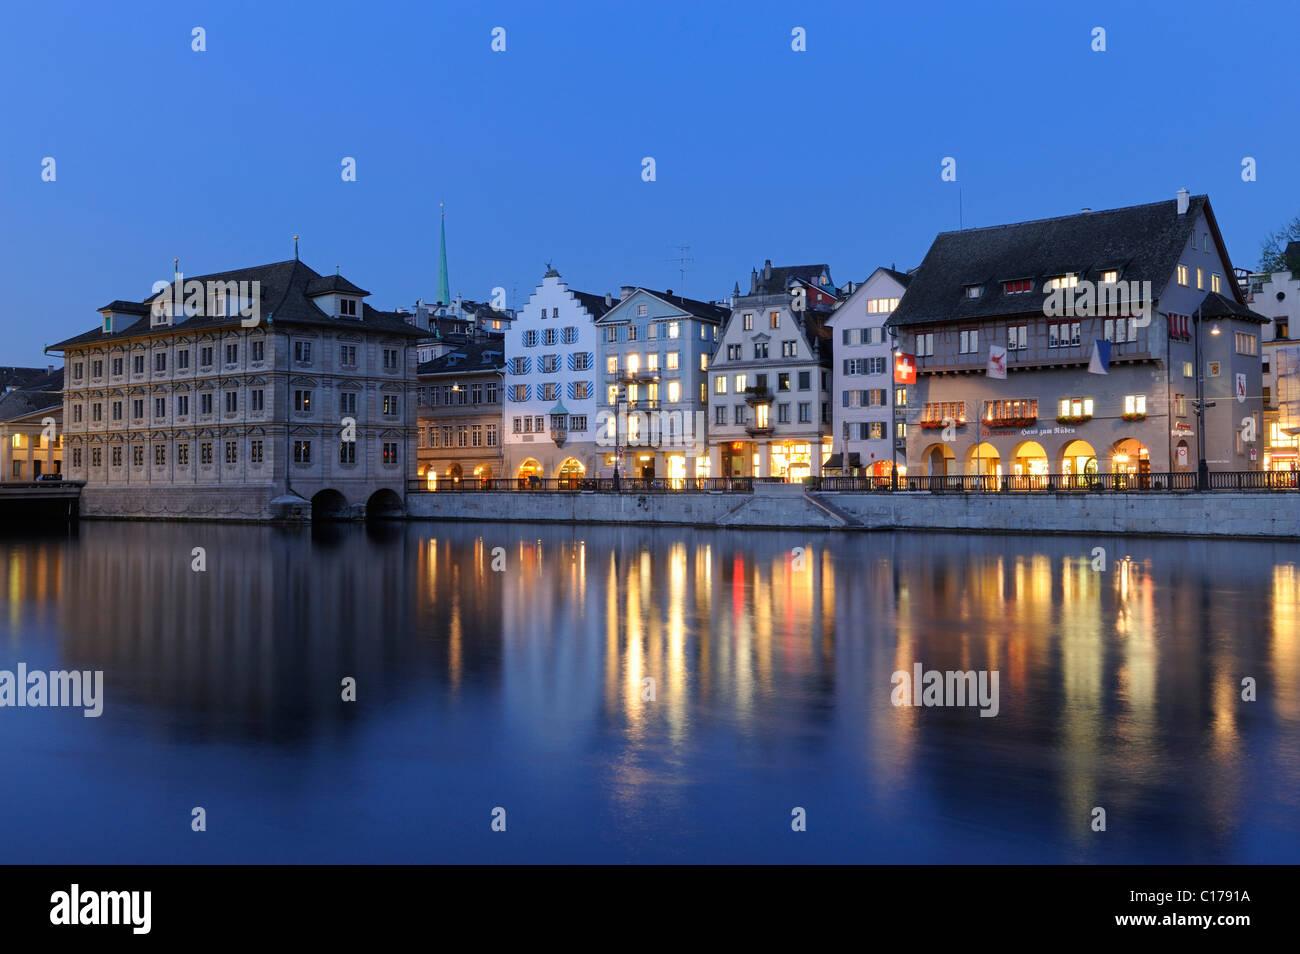 Banks of Limmat with Guildhall Zum Rueden and Zuerich City Hall, Switzerland, Europe - Stock Image